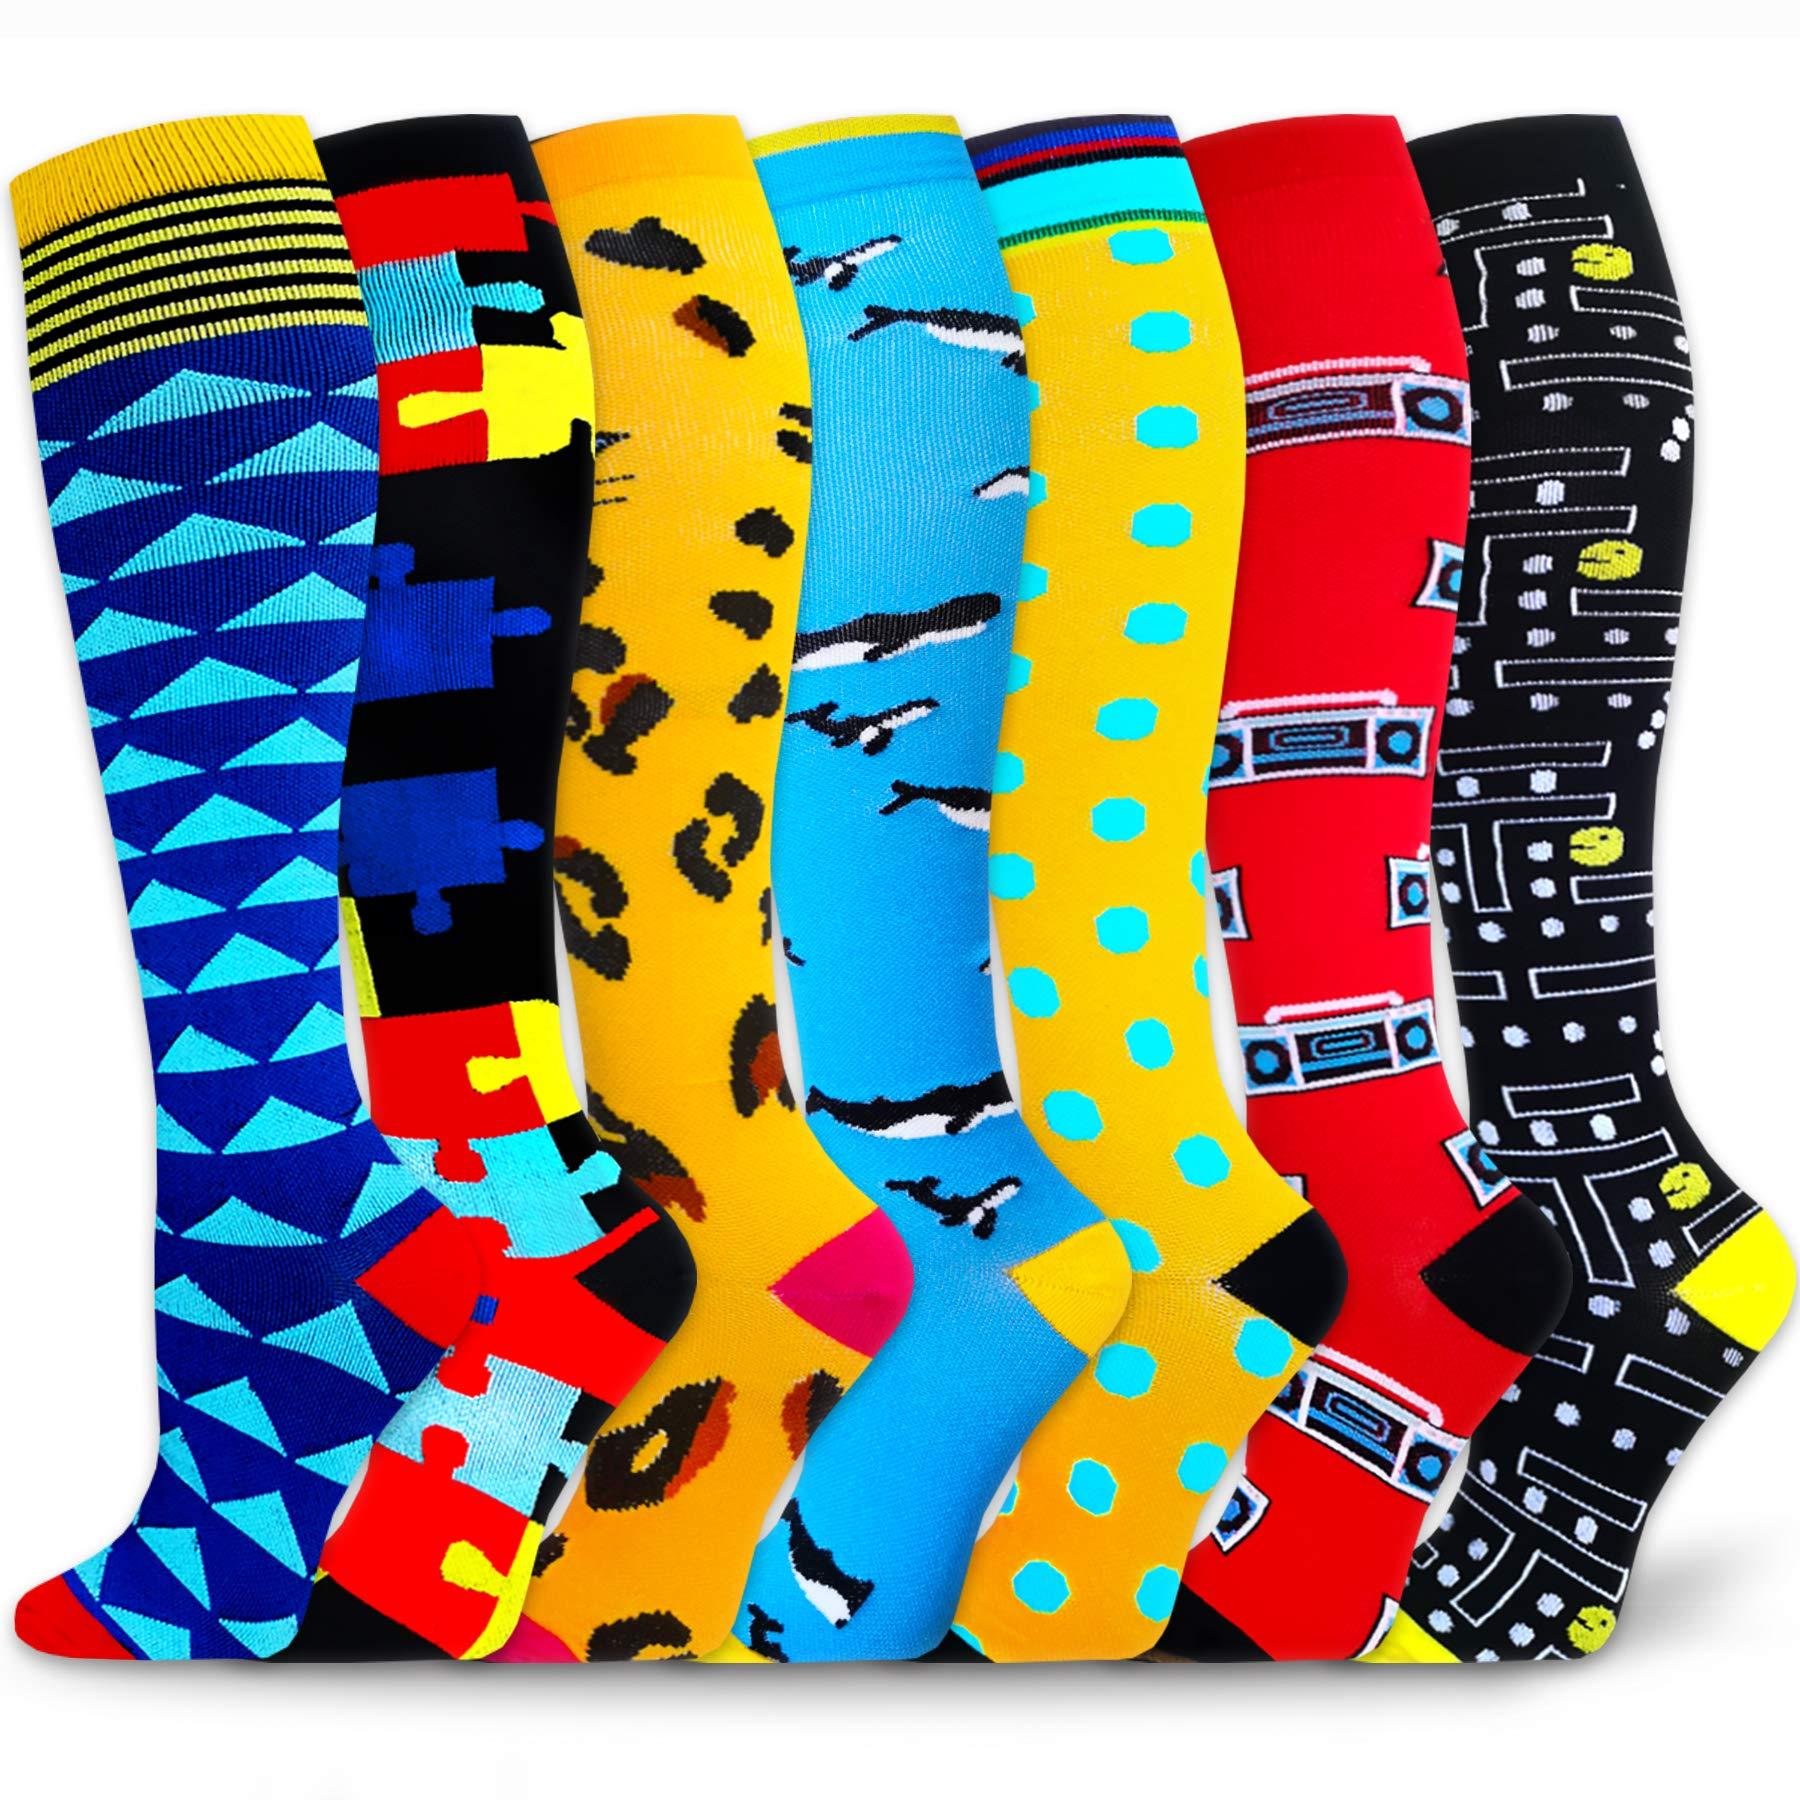 7 Pack Compression Socks Women & Men 20-30 mmHg , Best Athletic & Medical Running Flight Travel Pregnant